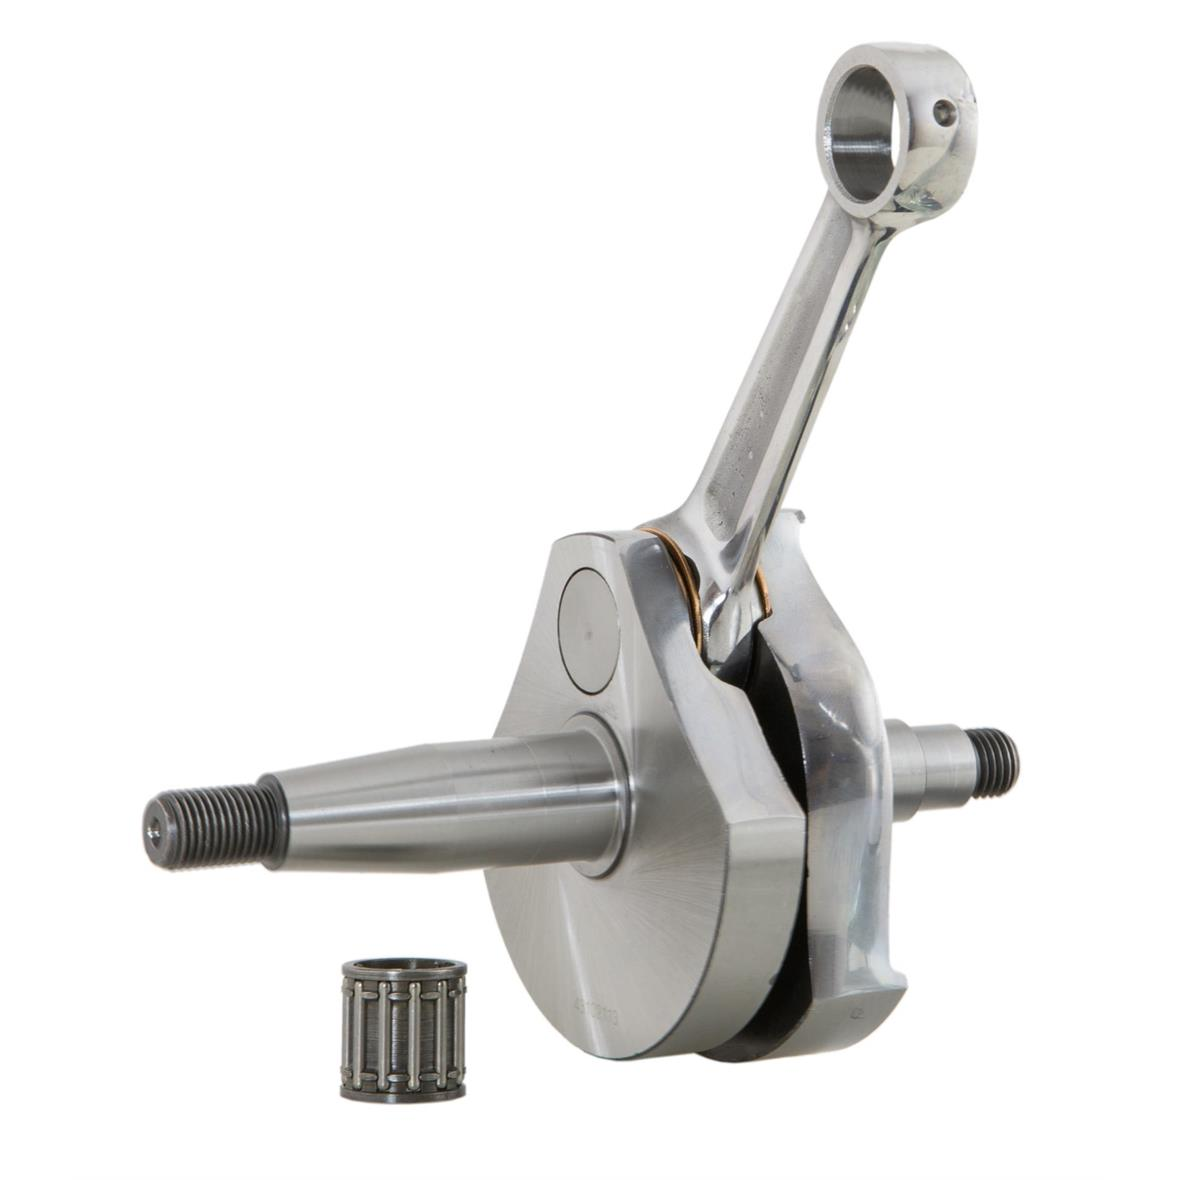 Product Image for 'Racing Crankshaft JASIL SuperTitle'